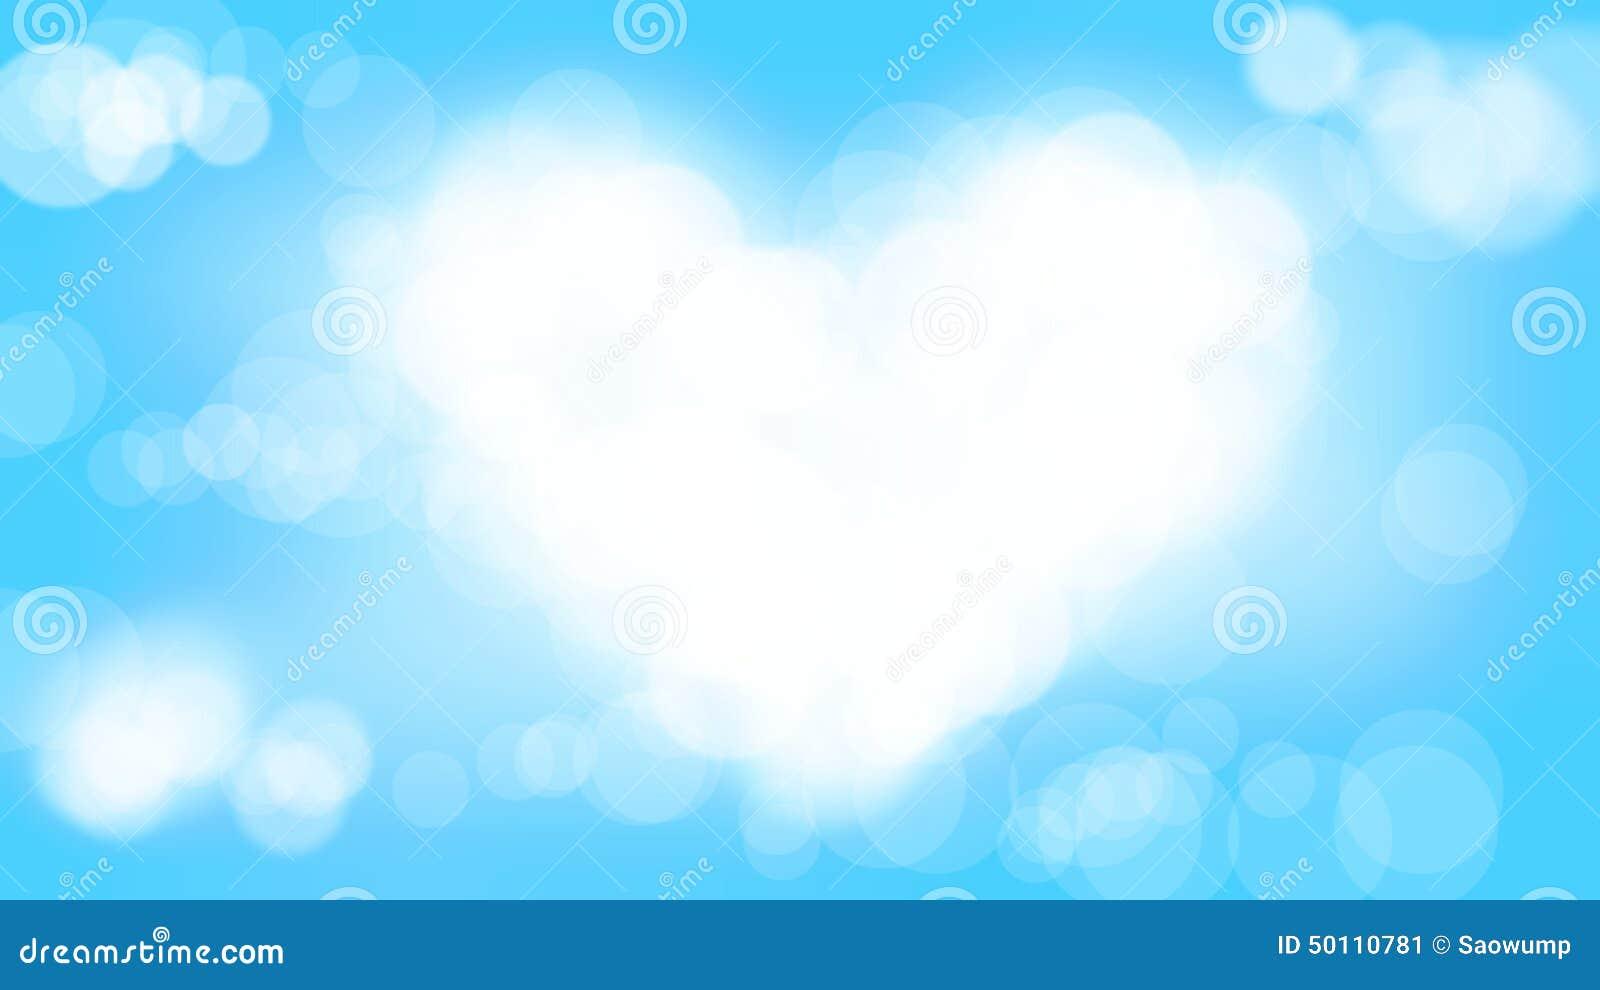 light blue heart background - photo #7